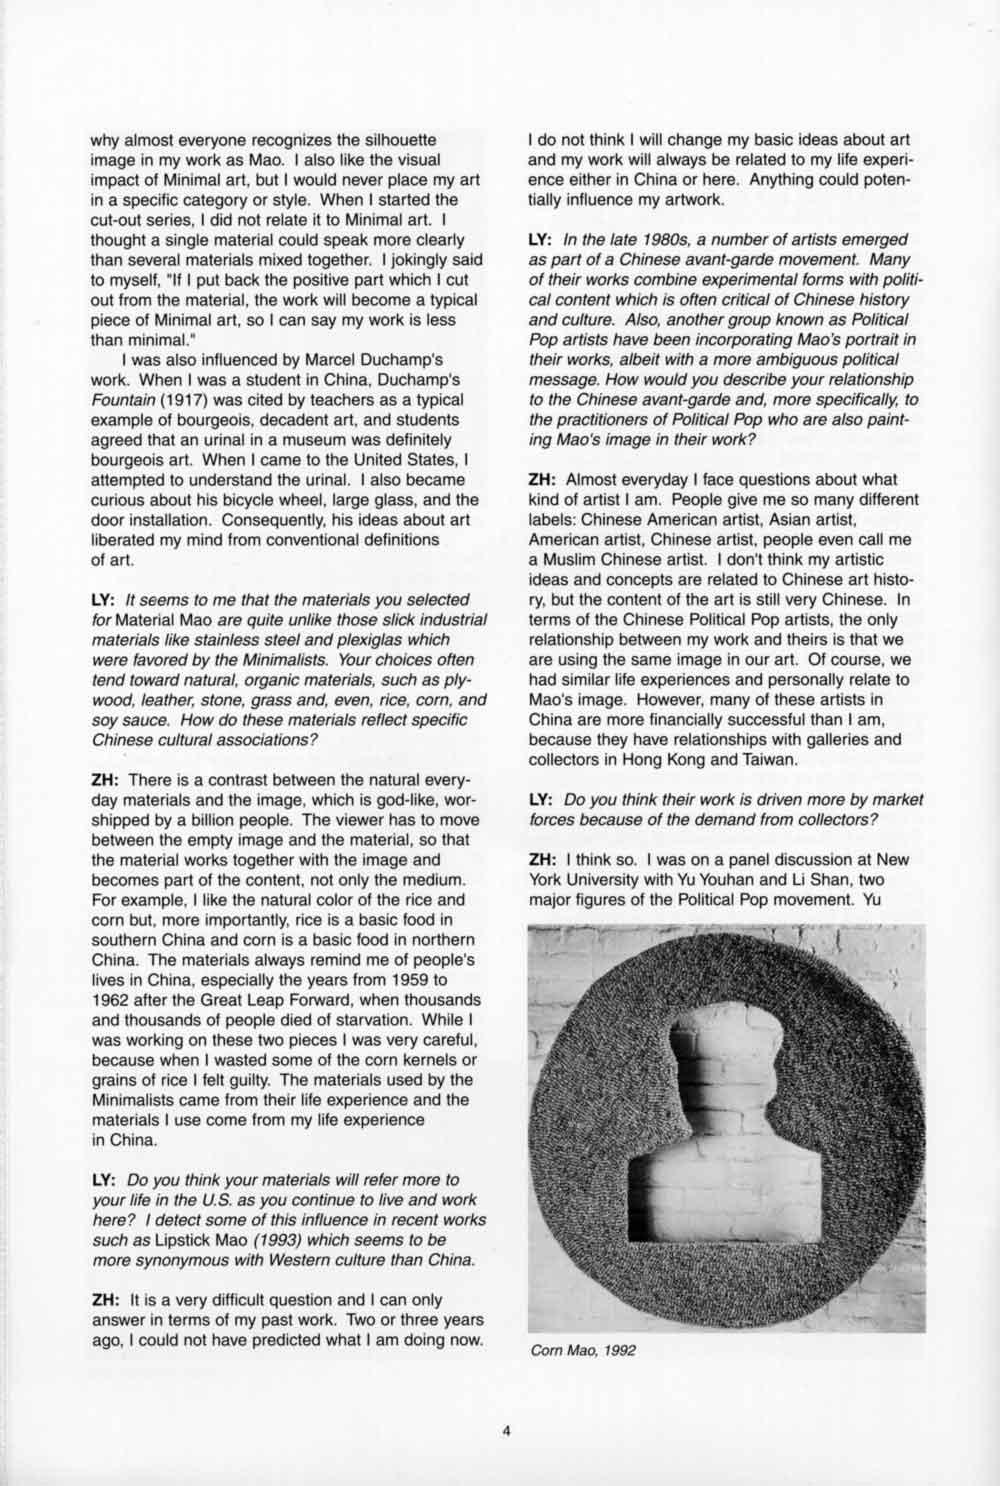 Material Mao, pg 5